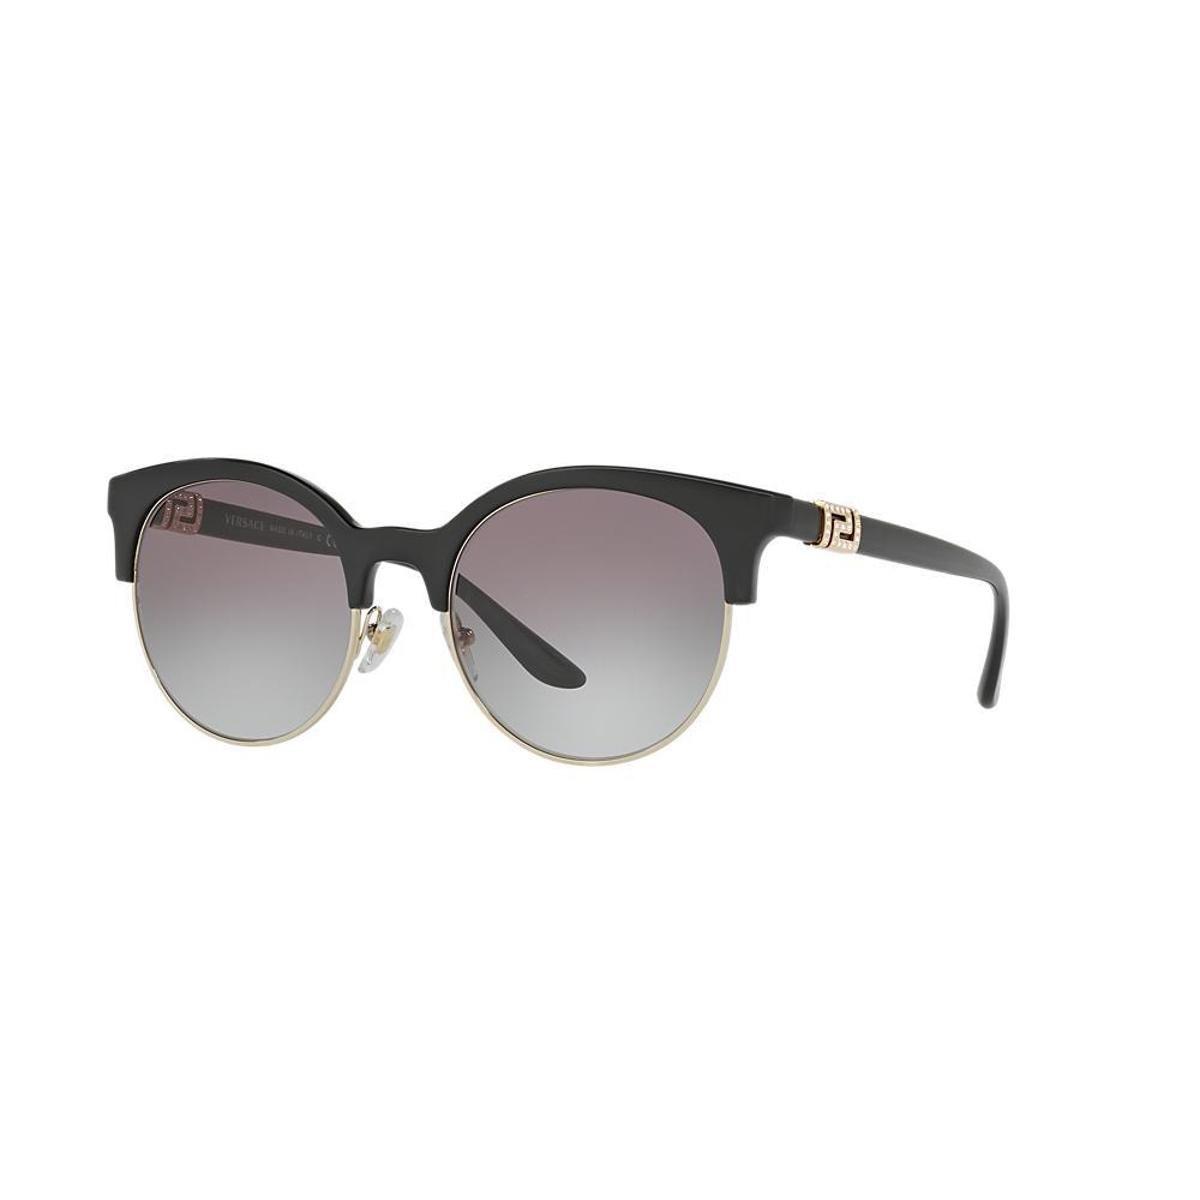 Óculos de Sol Versace Redondo VE4326B Feminino - Compre Agora   Zattini e5e4d3b2e1